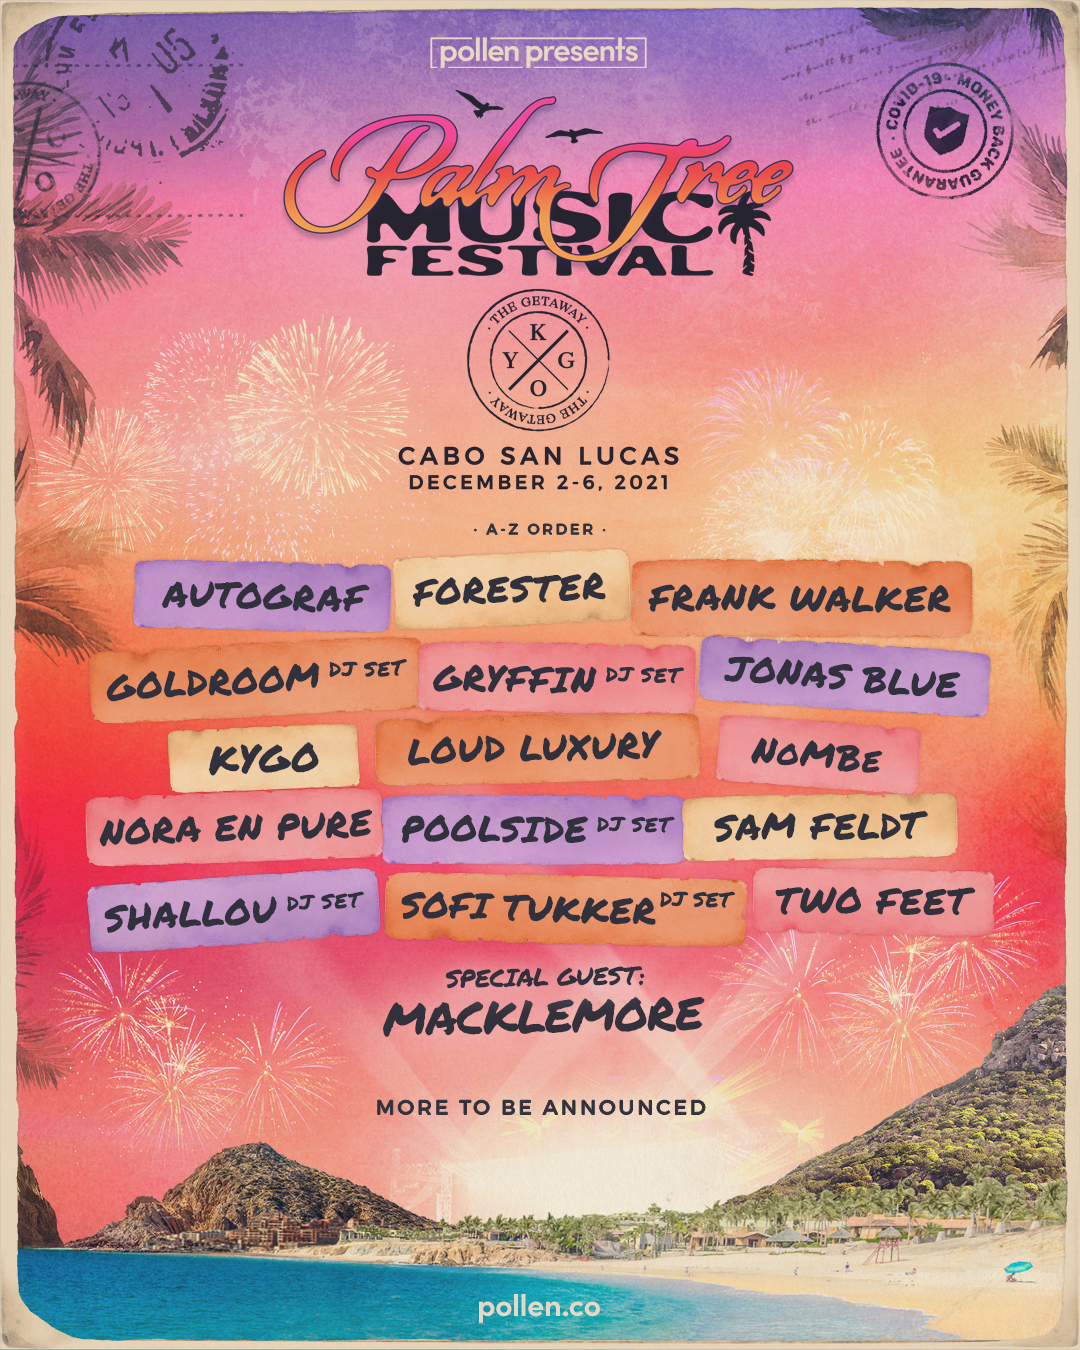 Palm Tree Music Festival Pollen Presents